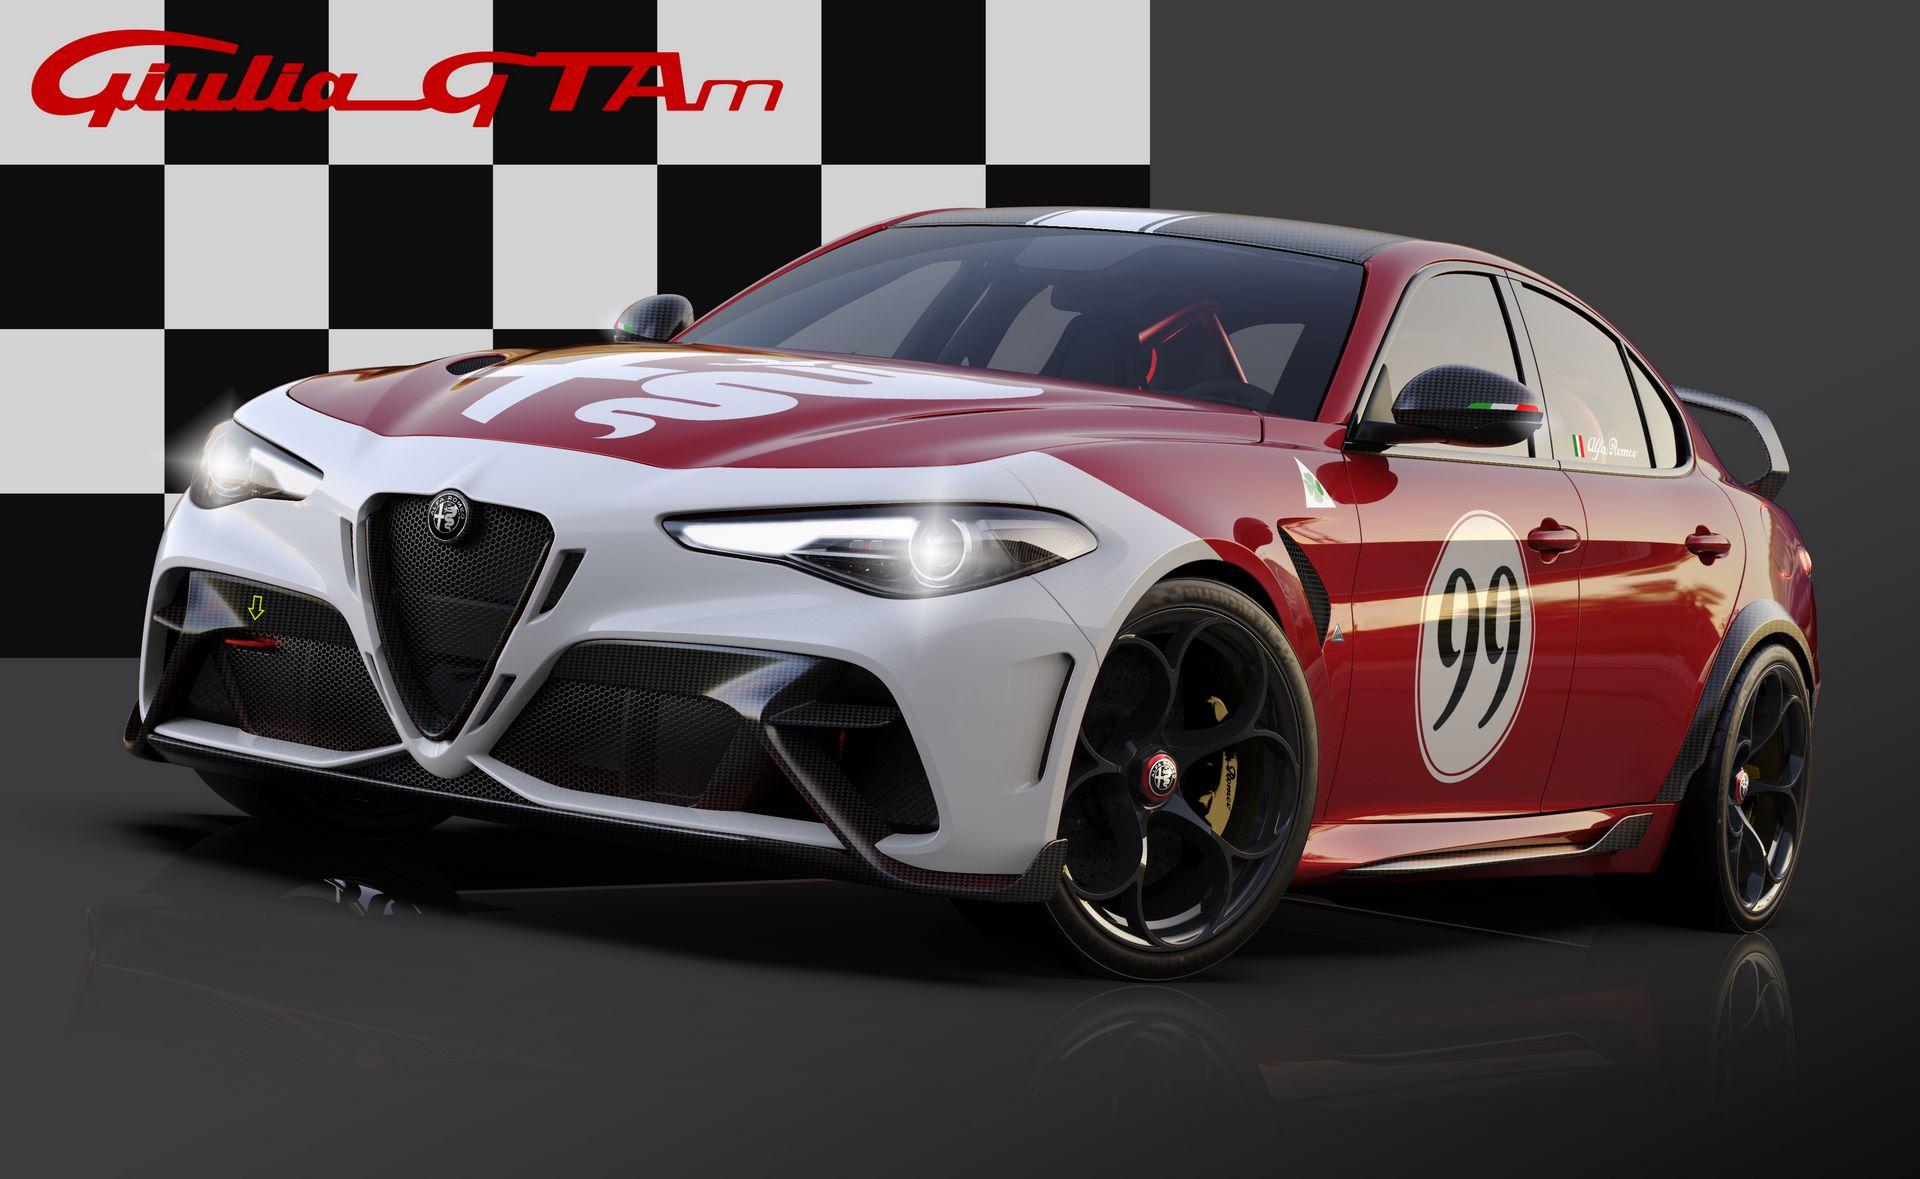 23_Alfa-Romeo-Giulia-GTA-dedicated-Livery